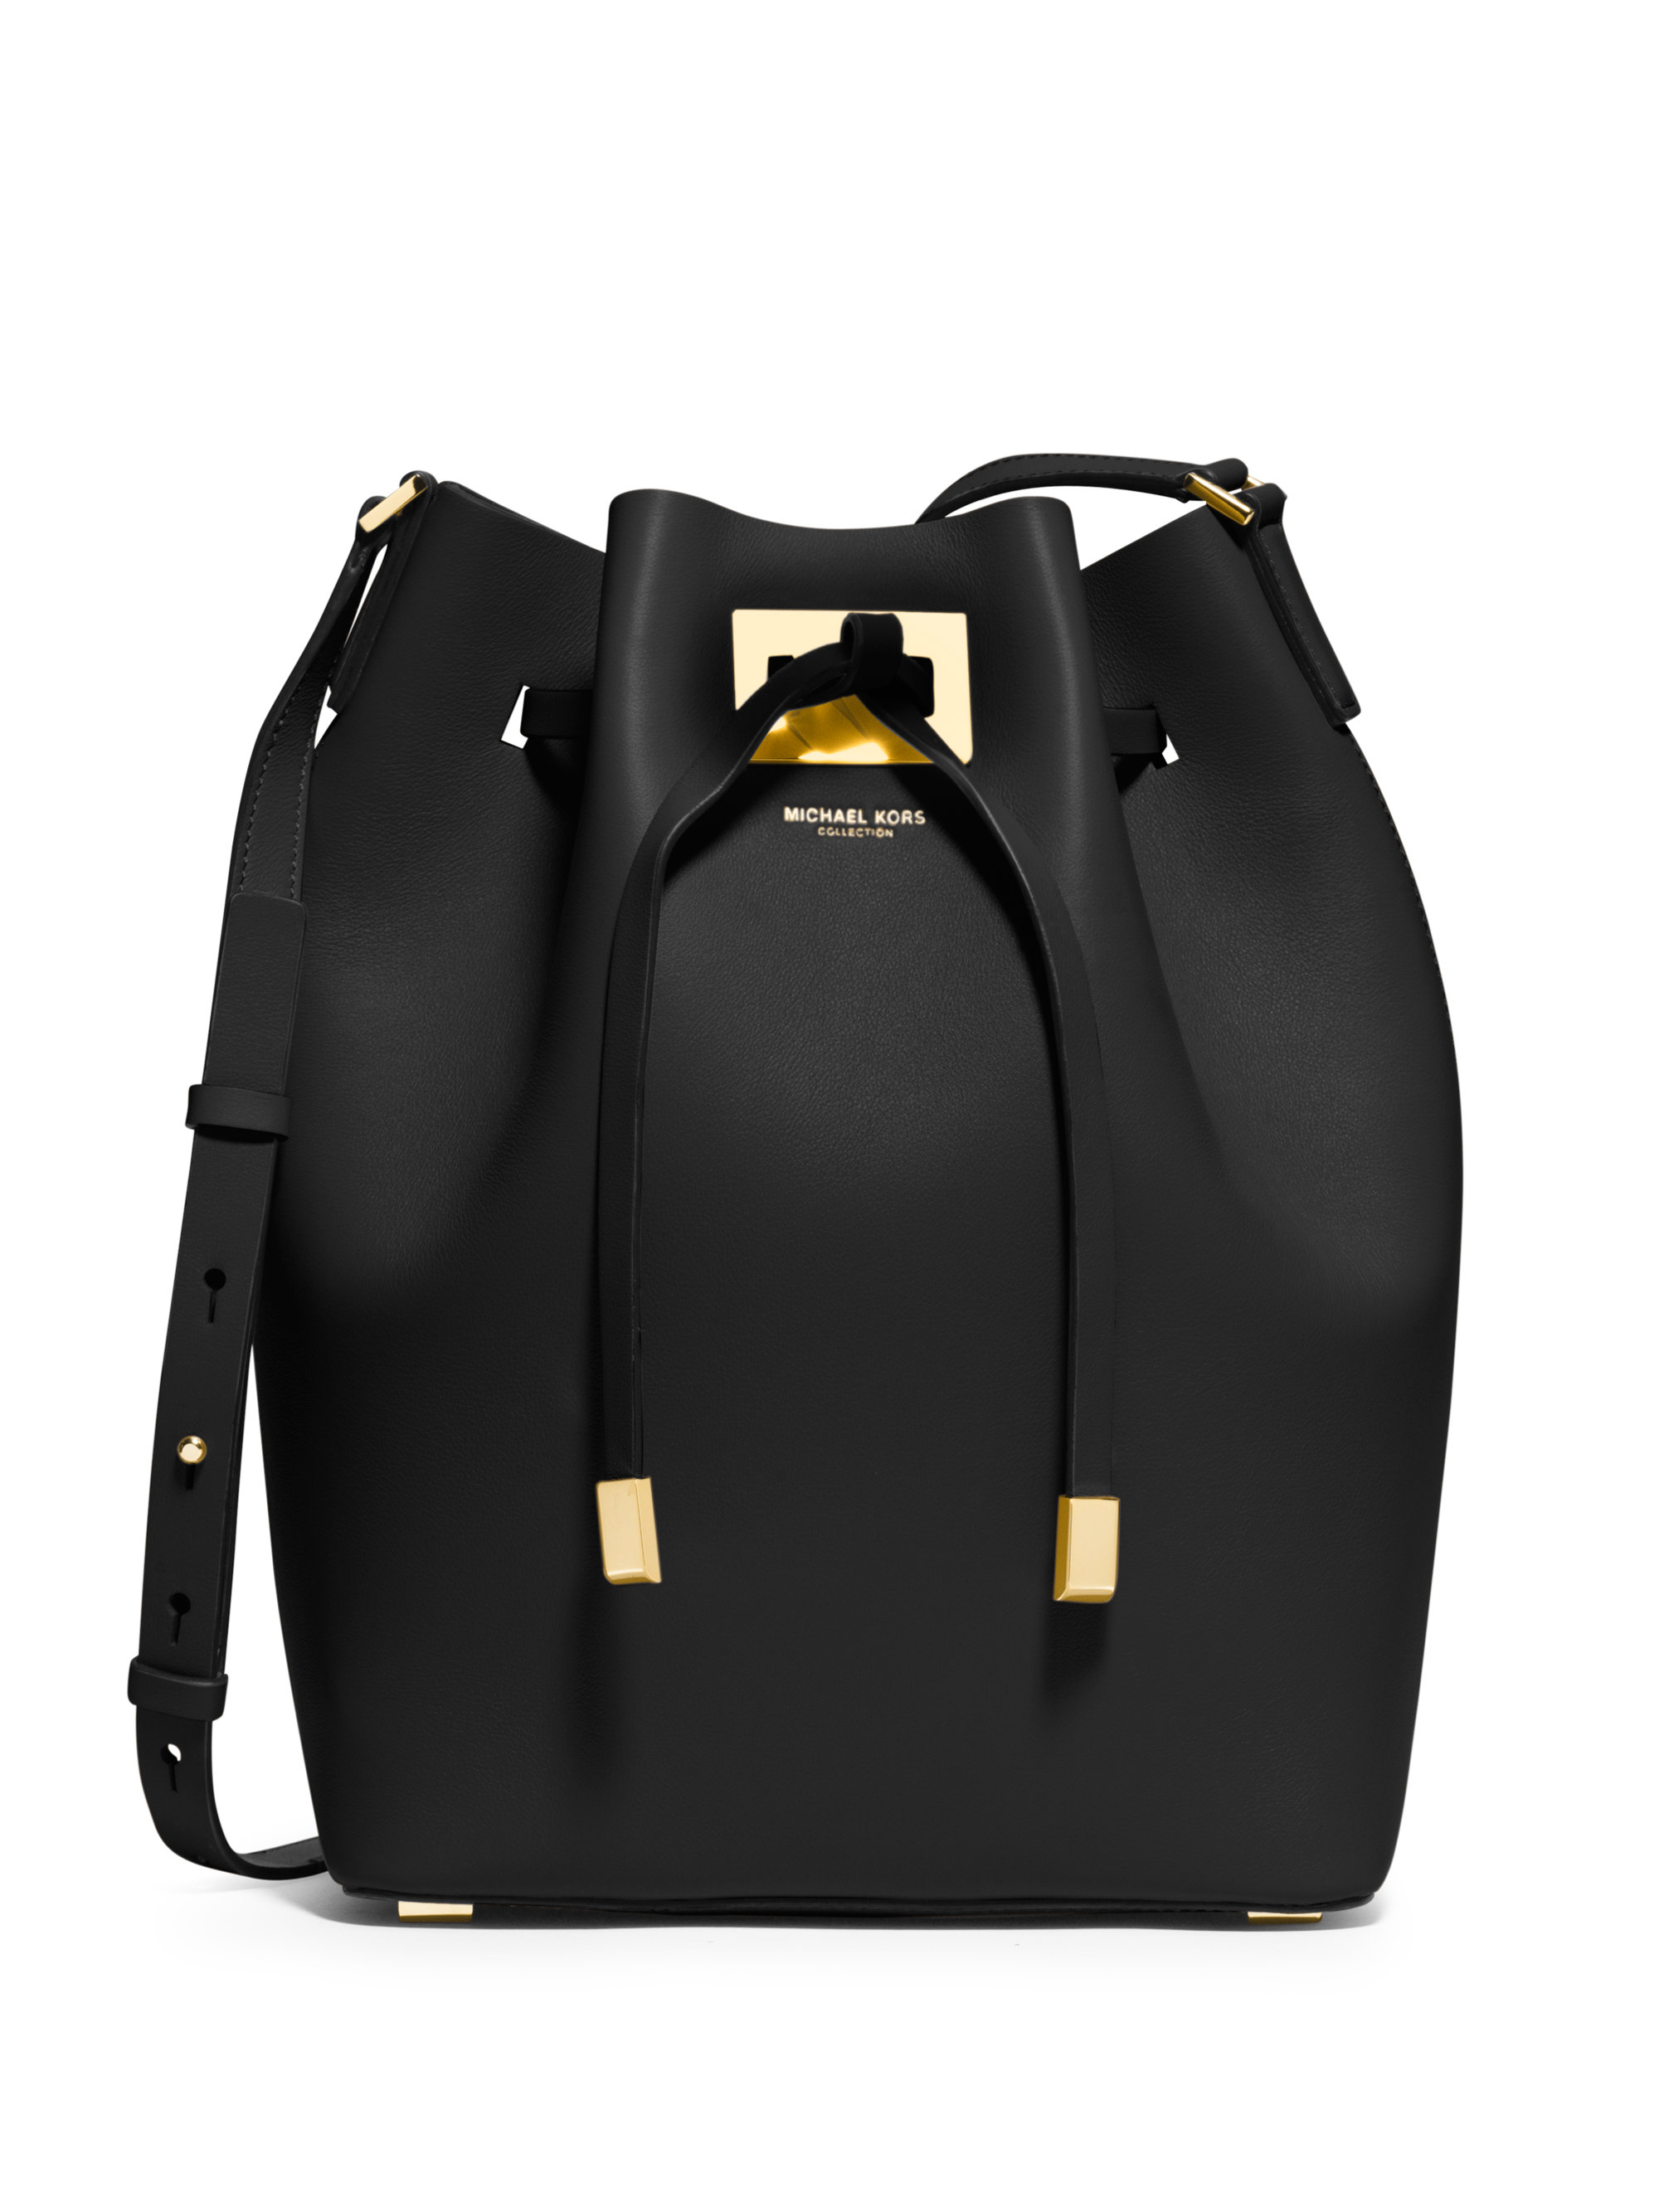 1a3ec97e79 Lyst - Michael Kors Miranda Large Bucket Bag in Black